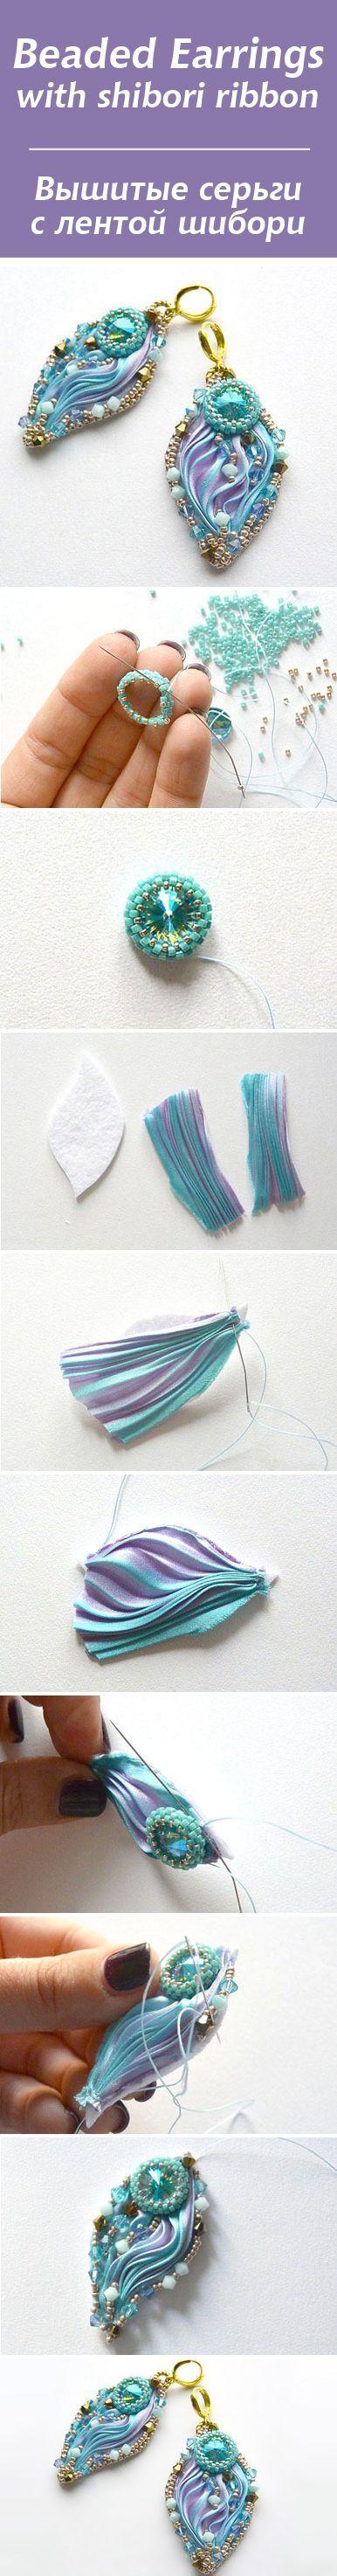 Earrings with Shibori silk ribbon tutorial | Мастер-класс: вышитые серьги с лентой шибори